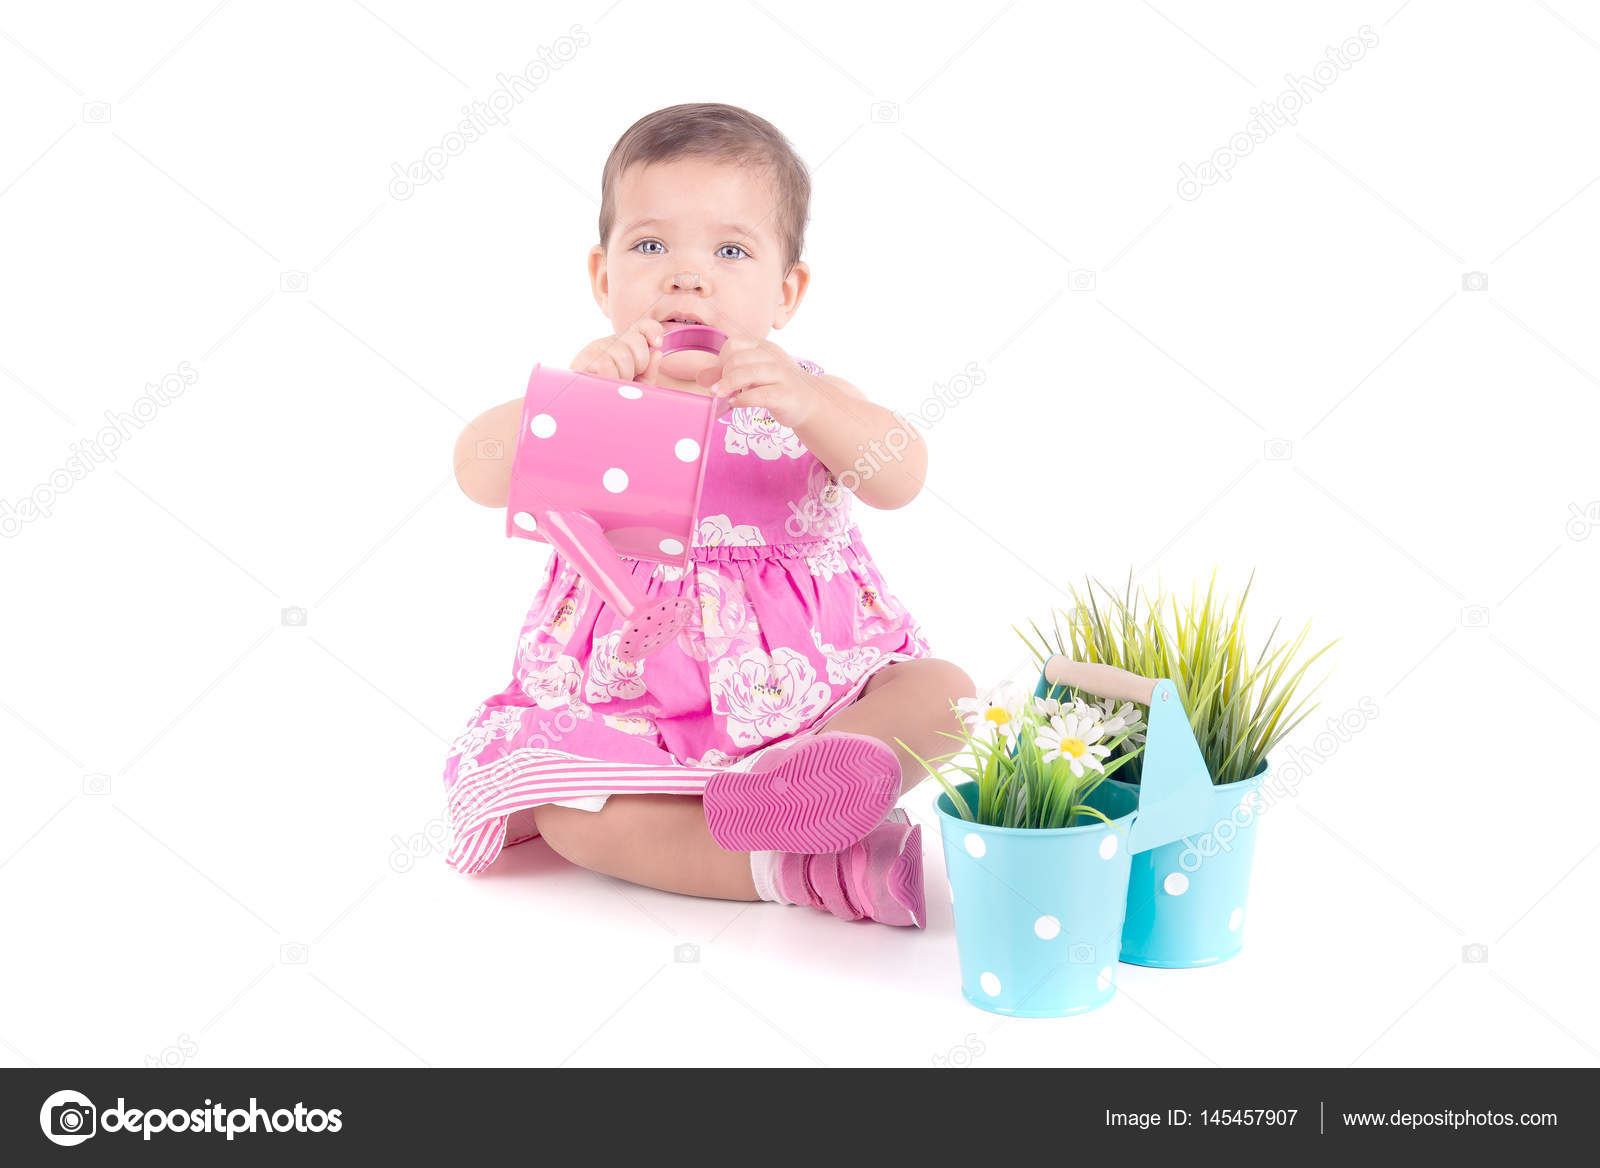 7e110aed5a353b Babymeisje in roze jurk drenken bloempotten geïsoleerd op witte achtergrond  — Foto van verkoka